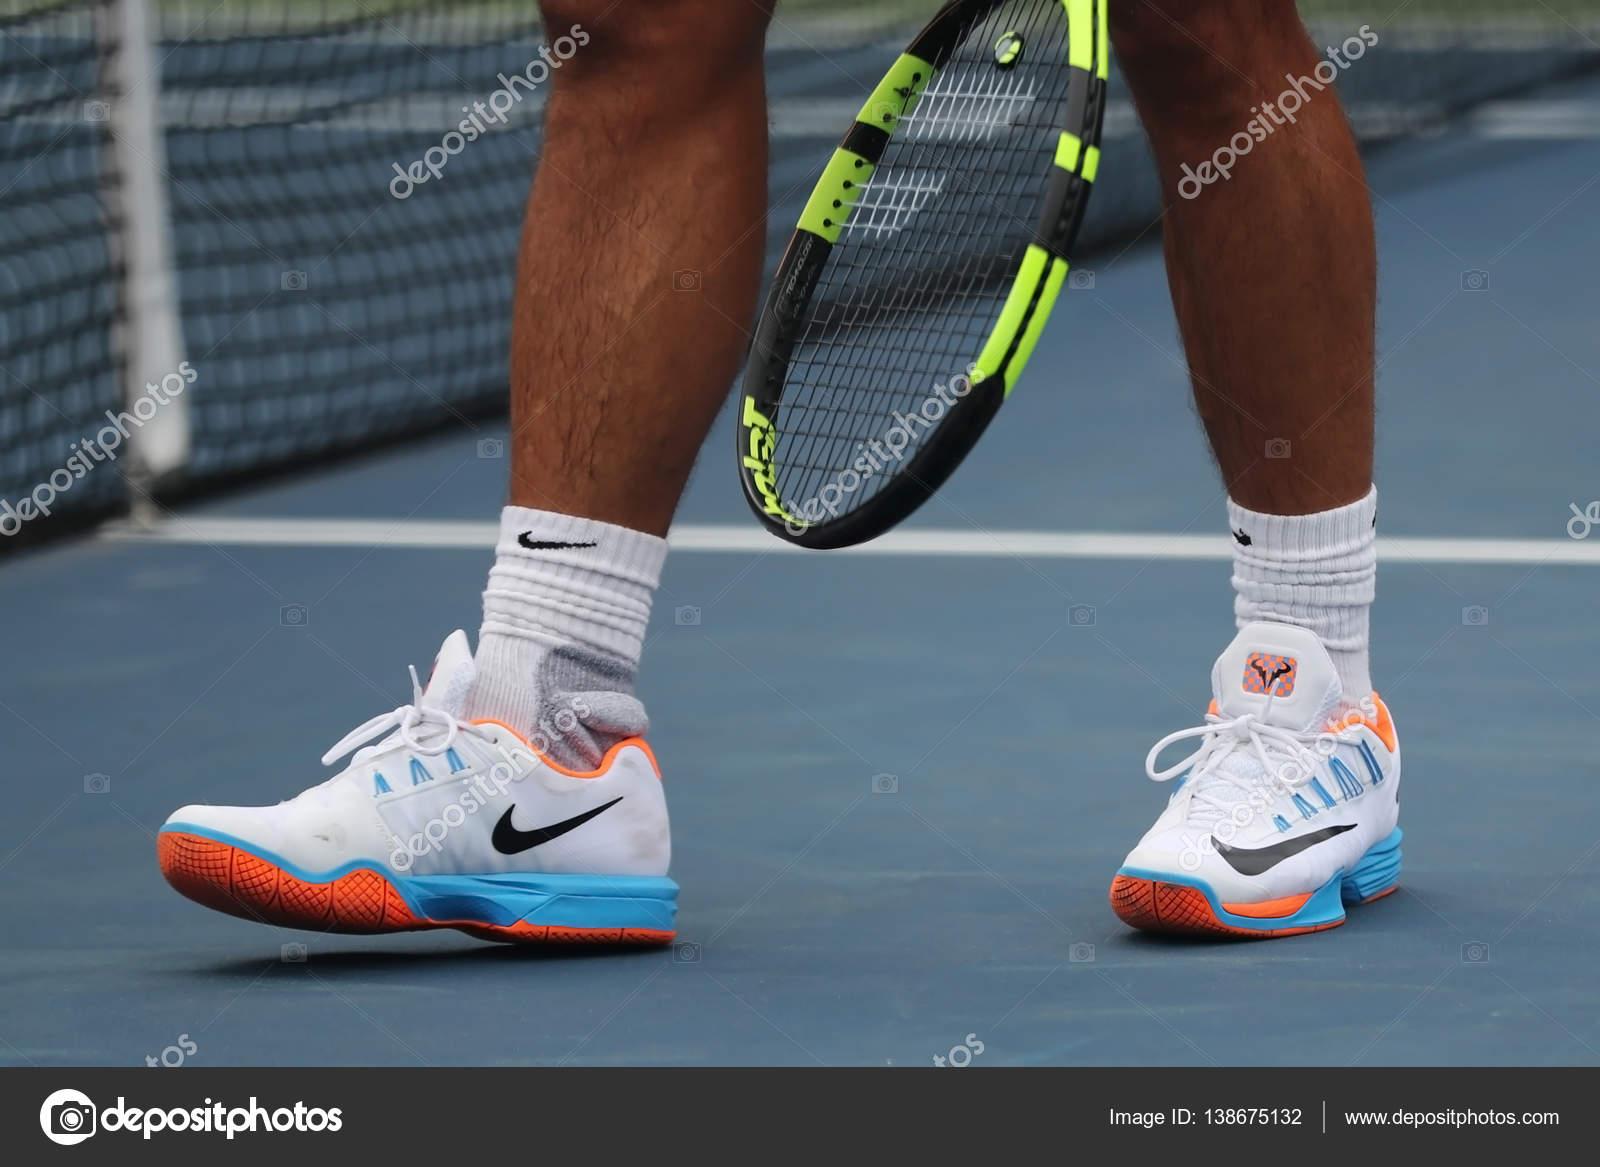 Grand Slam Champion Rafael Nadal Of Spain Wears Custom Nike Tennis Shoes During Practice For Us Open 2016 Stock Editorial Photo C Zhukovsky 138675132